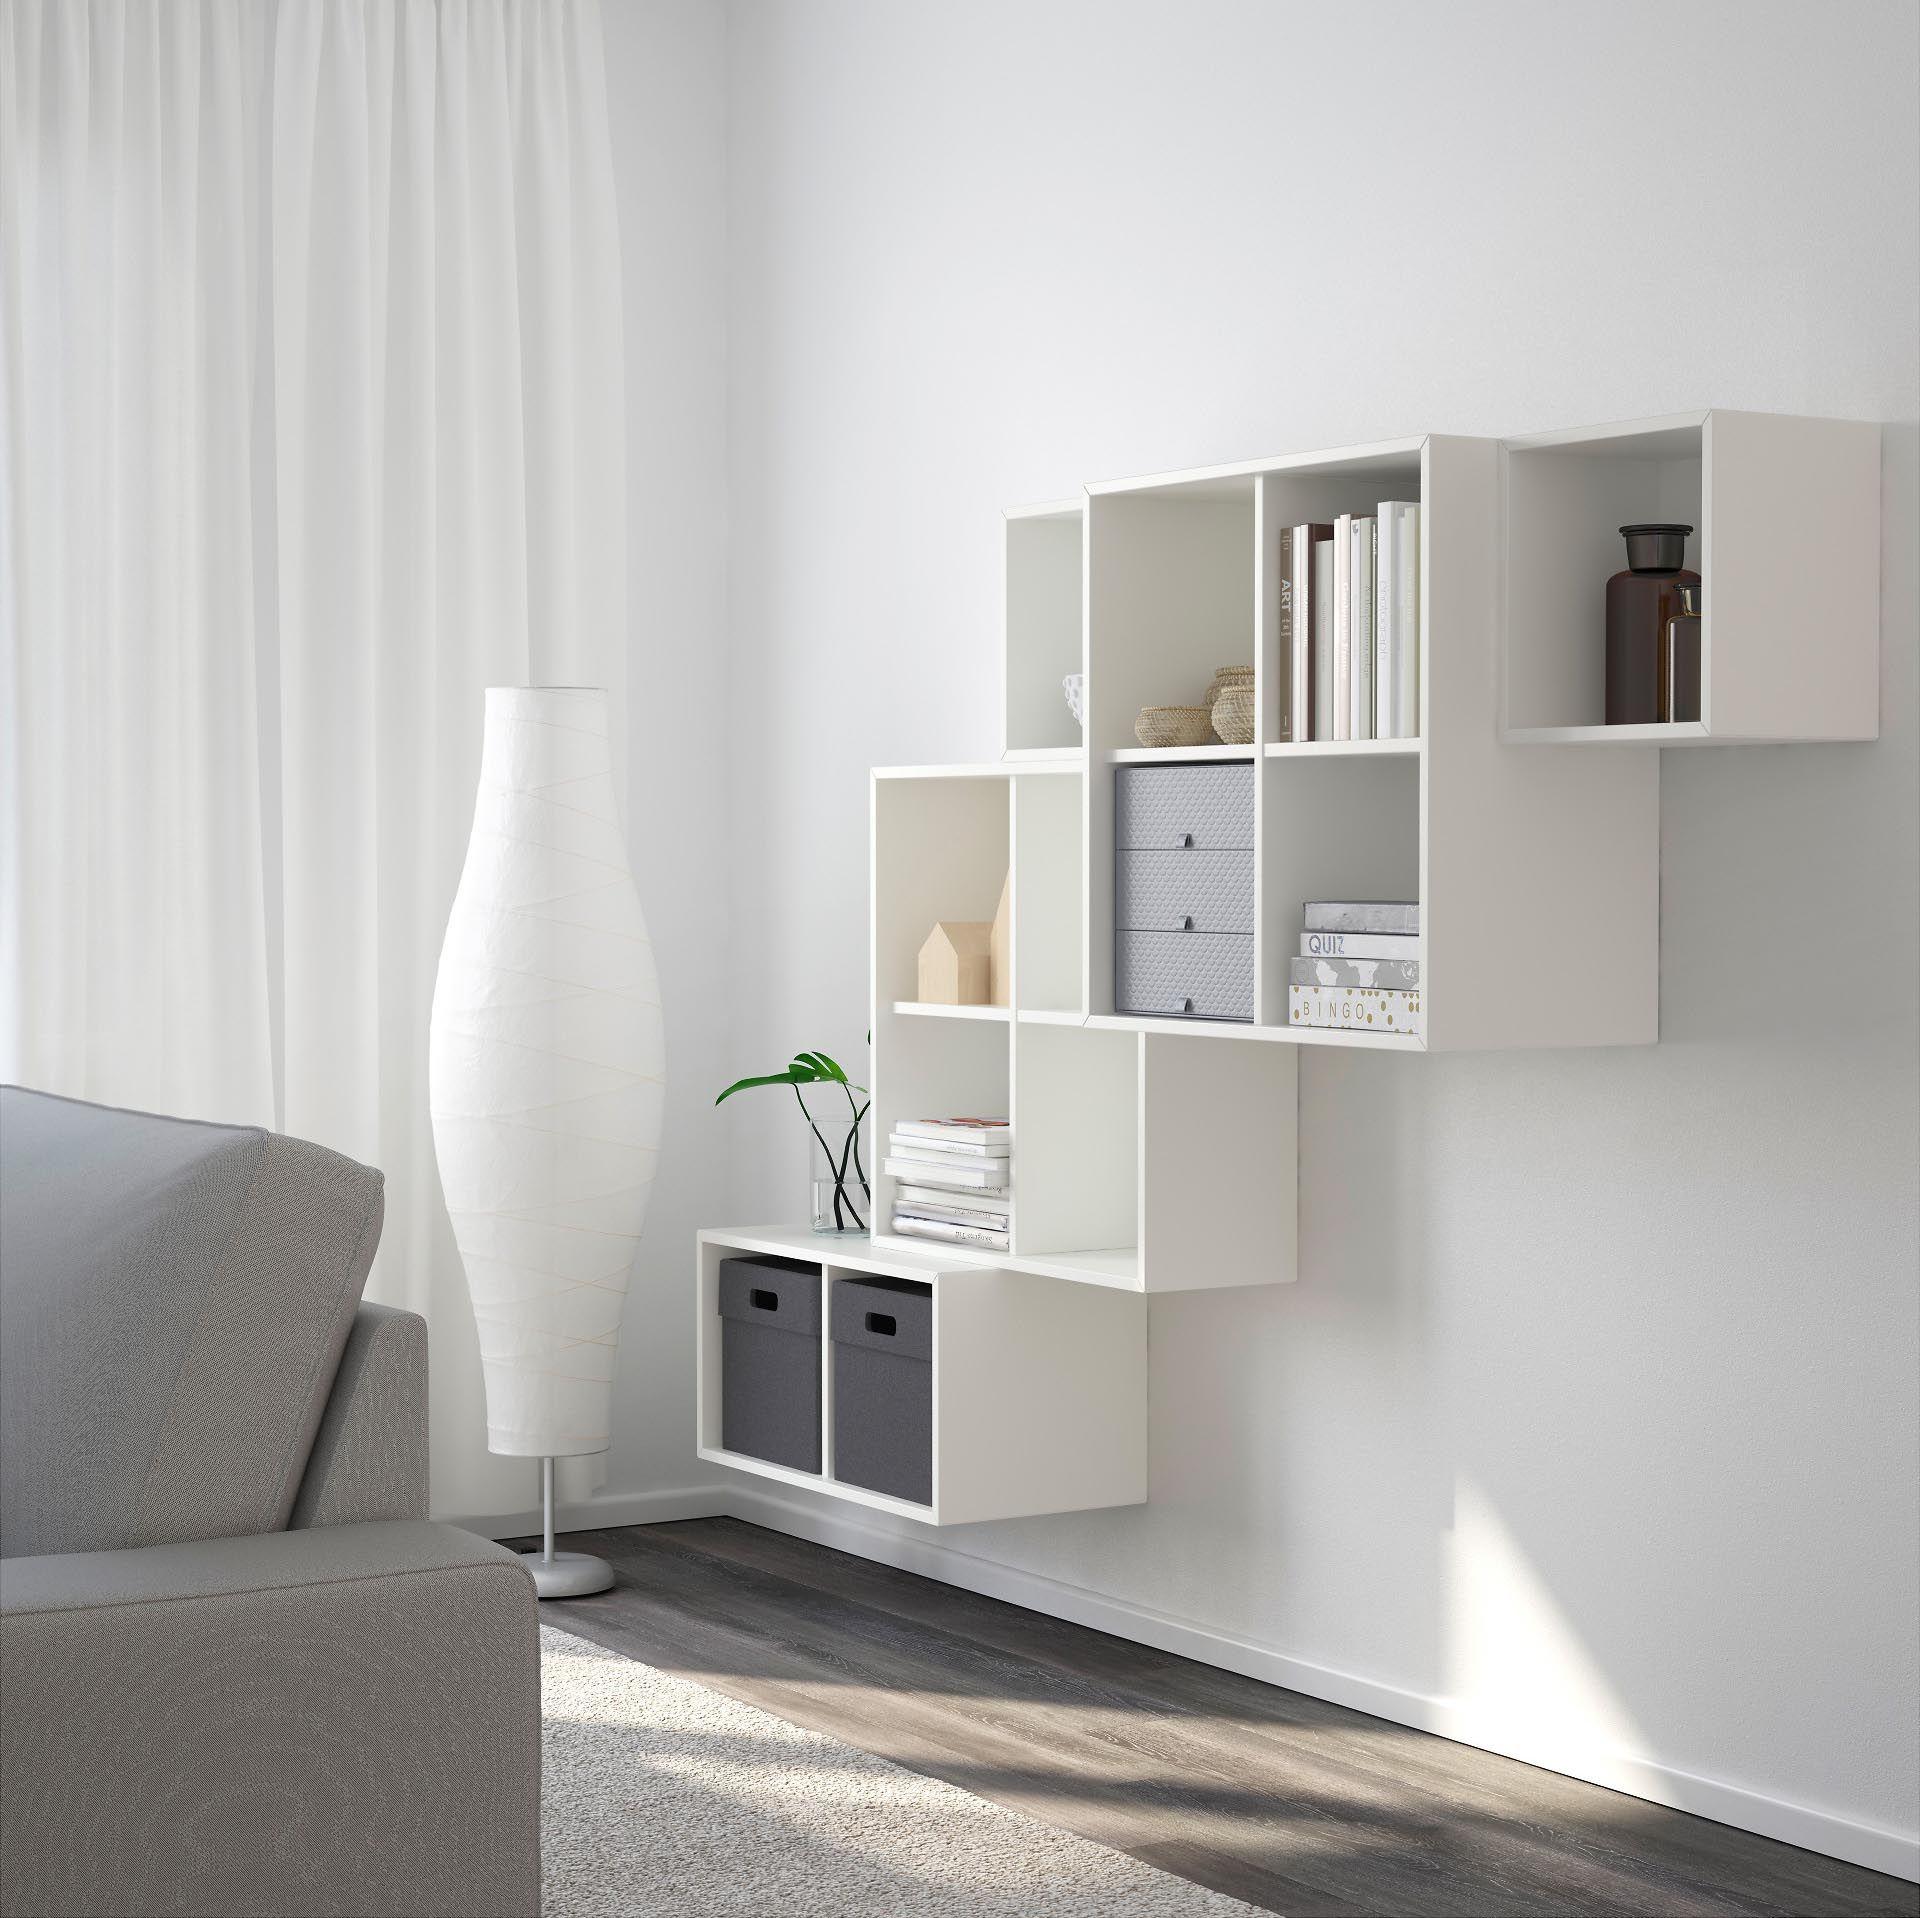 Ikea Storage Products Best Ikea Storage